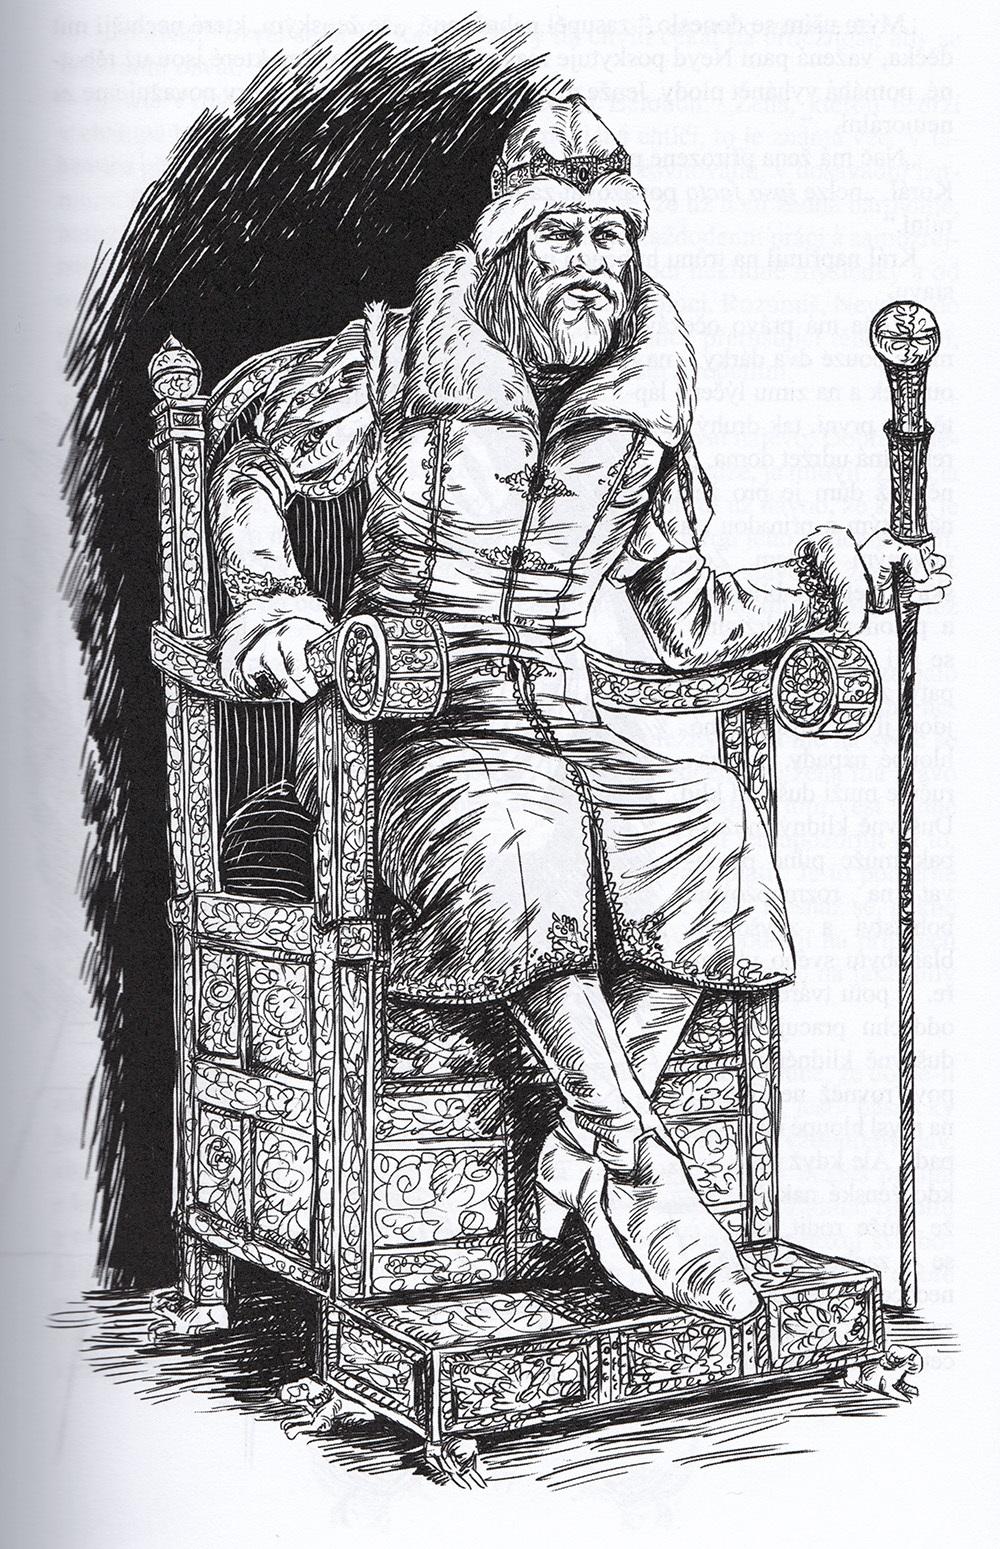 King Belohun of Kerack